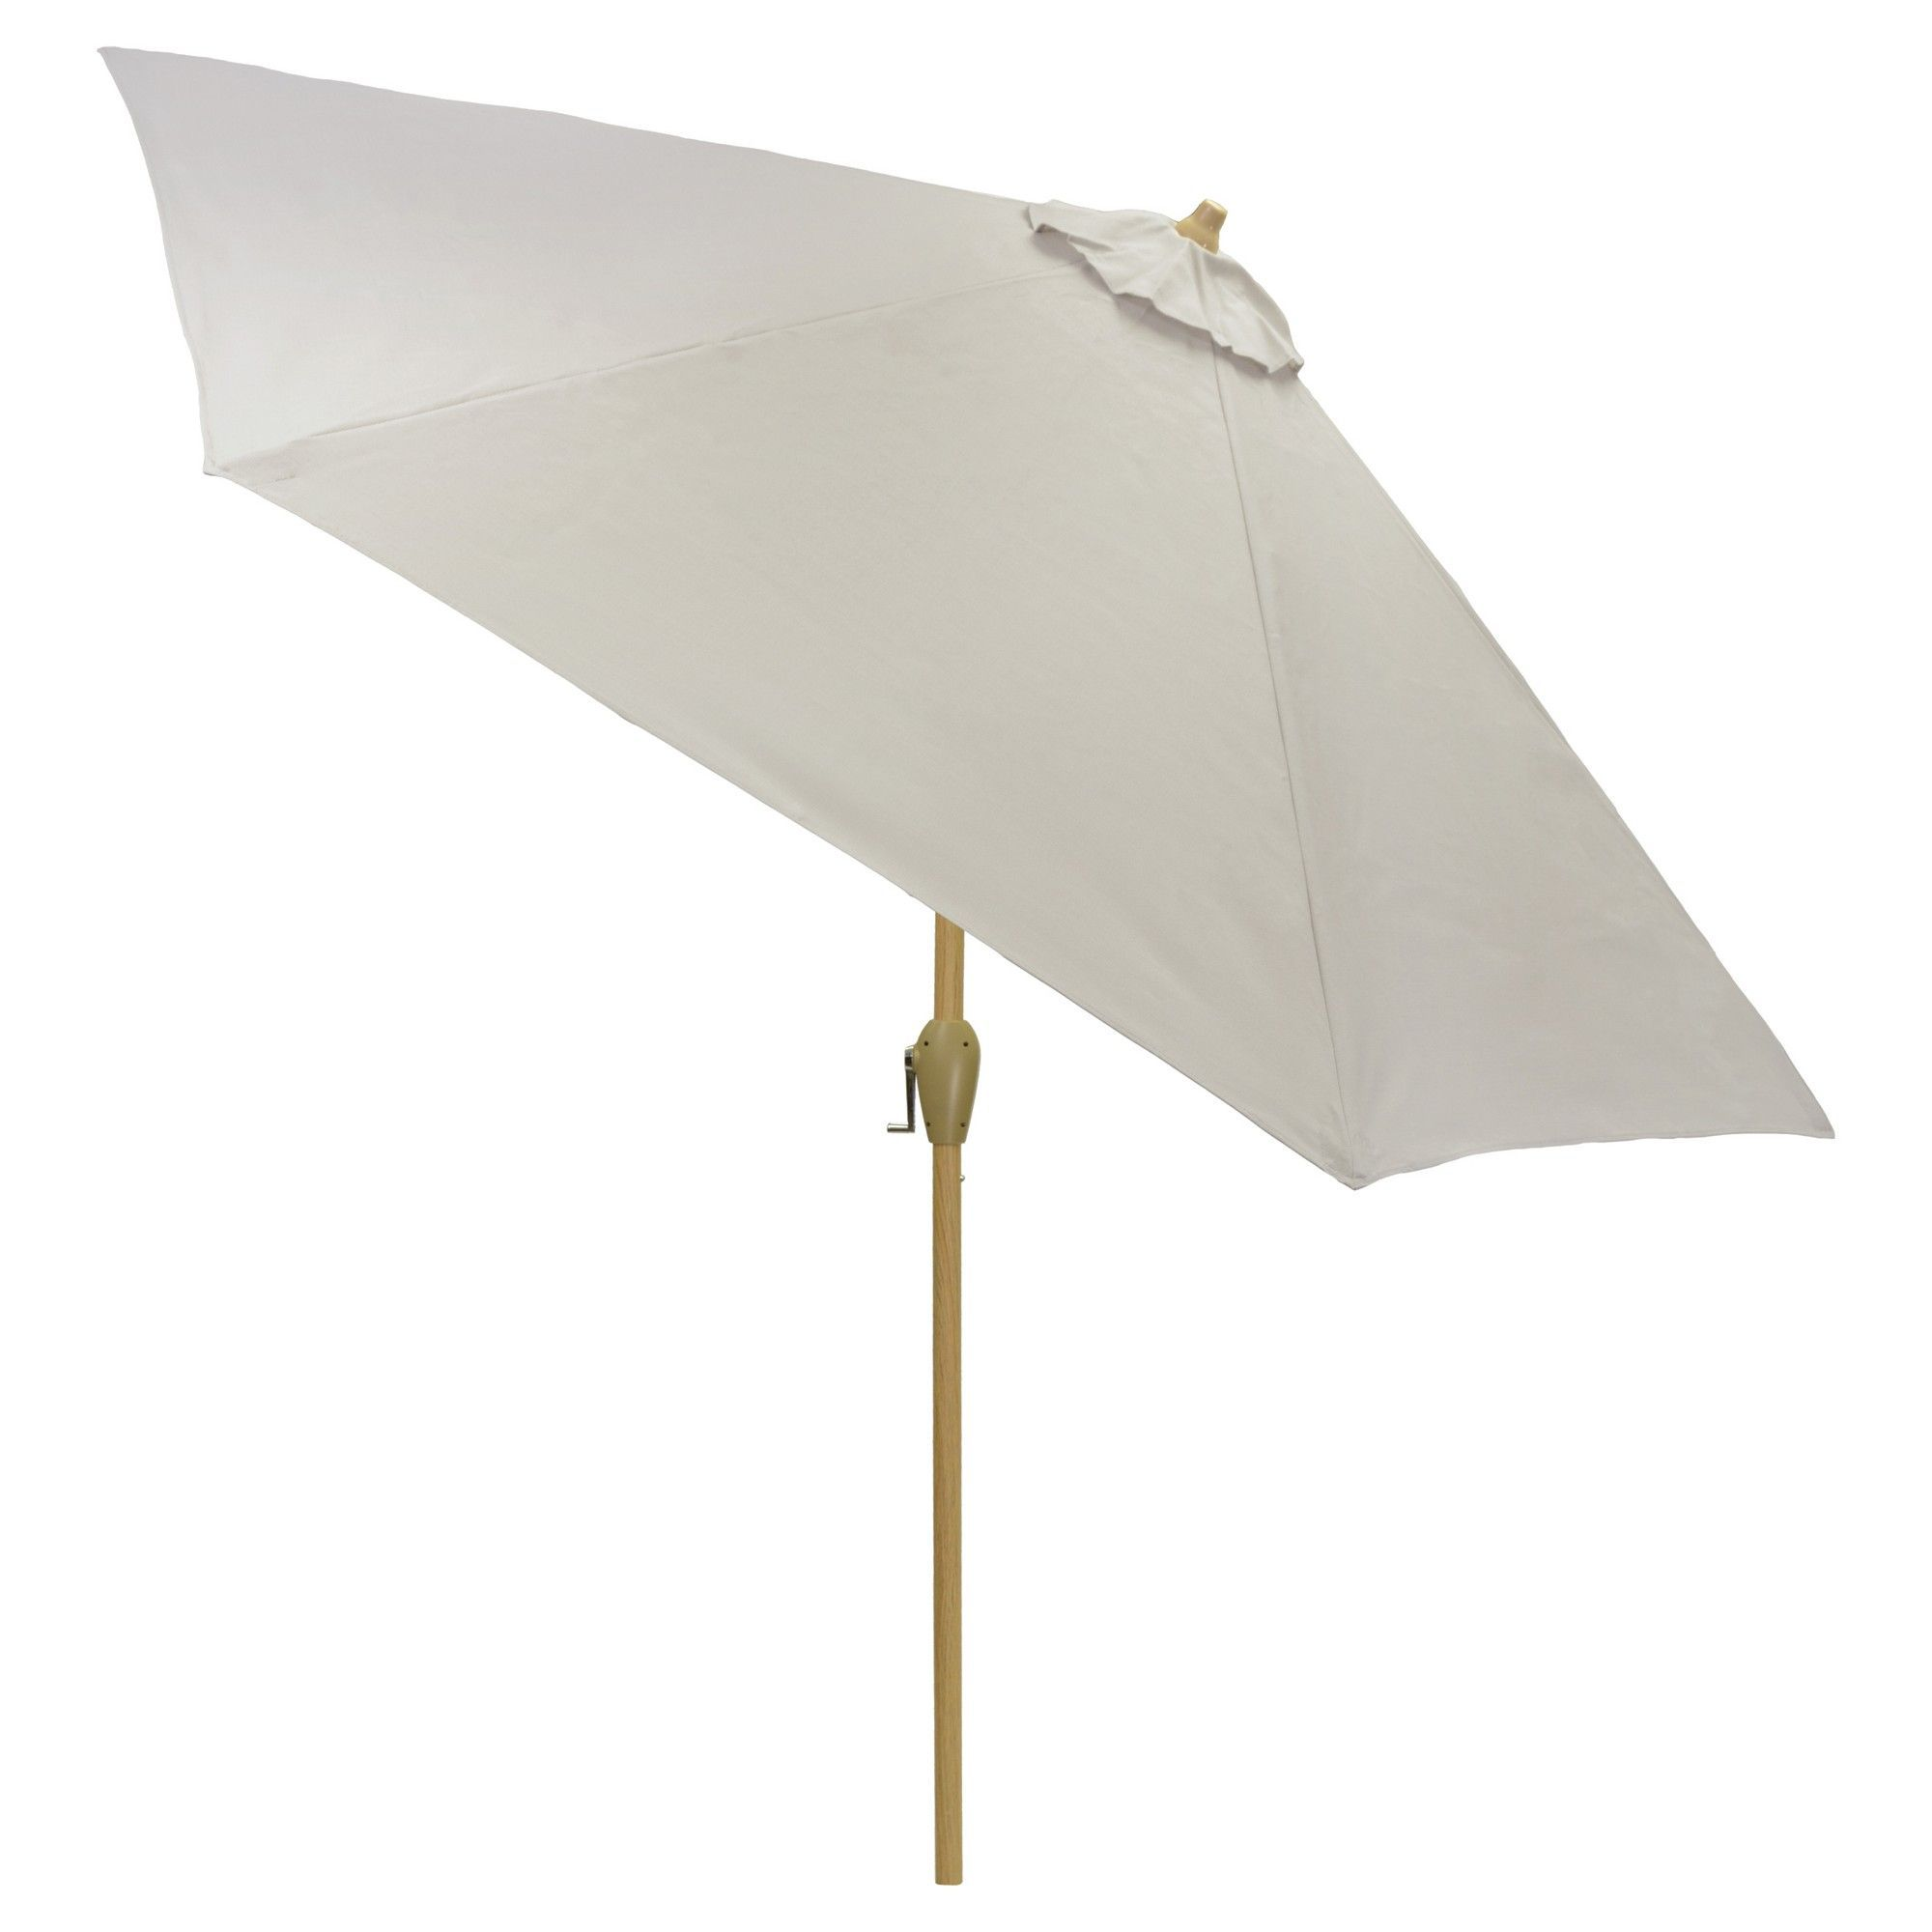 9 Round Sling Patio Umbrella Dove Gray Light Wood Pole